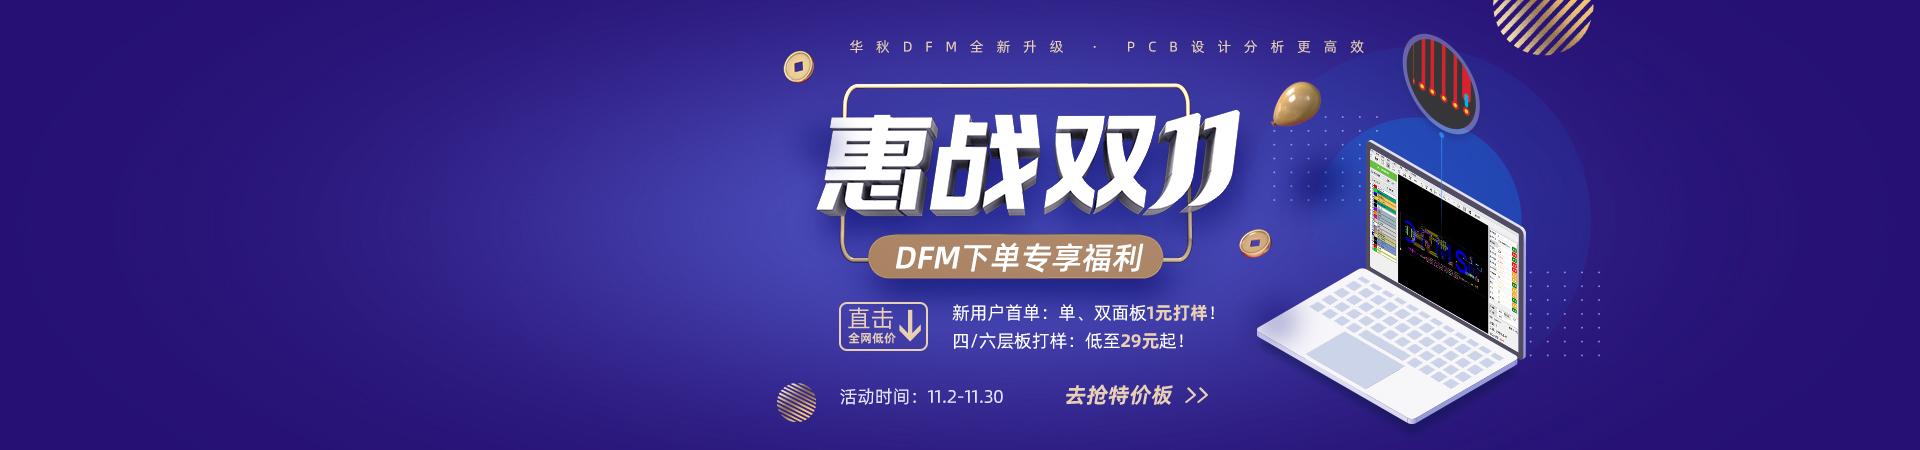 DFM特价板活动